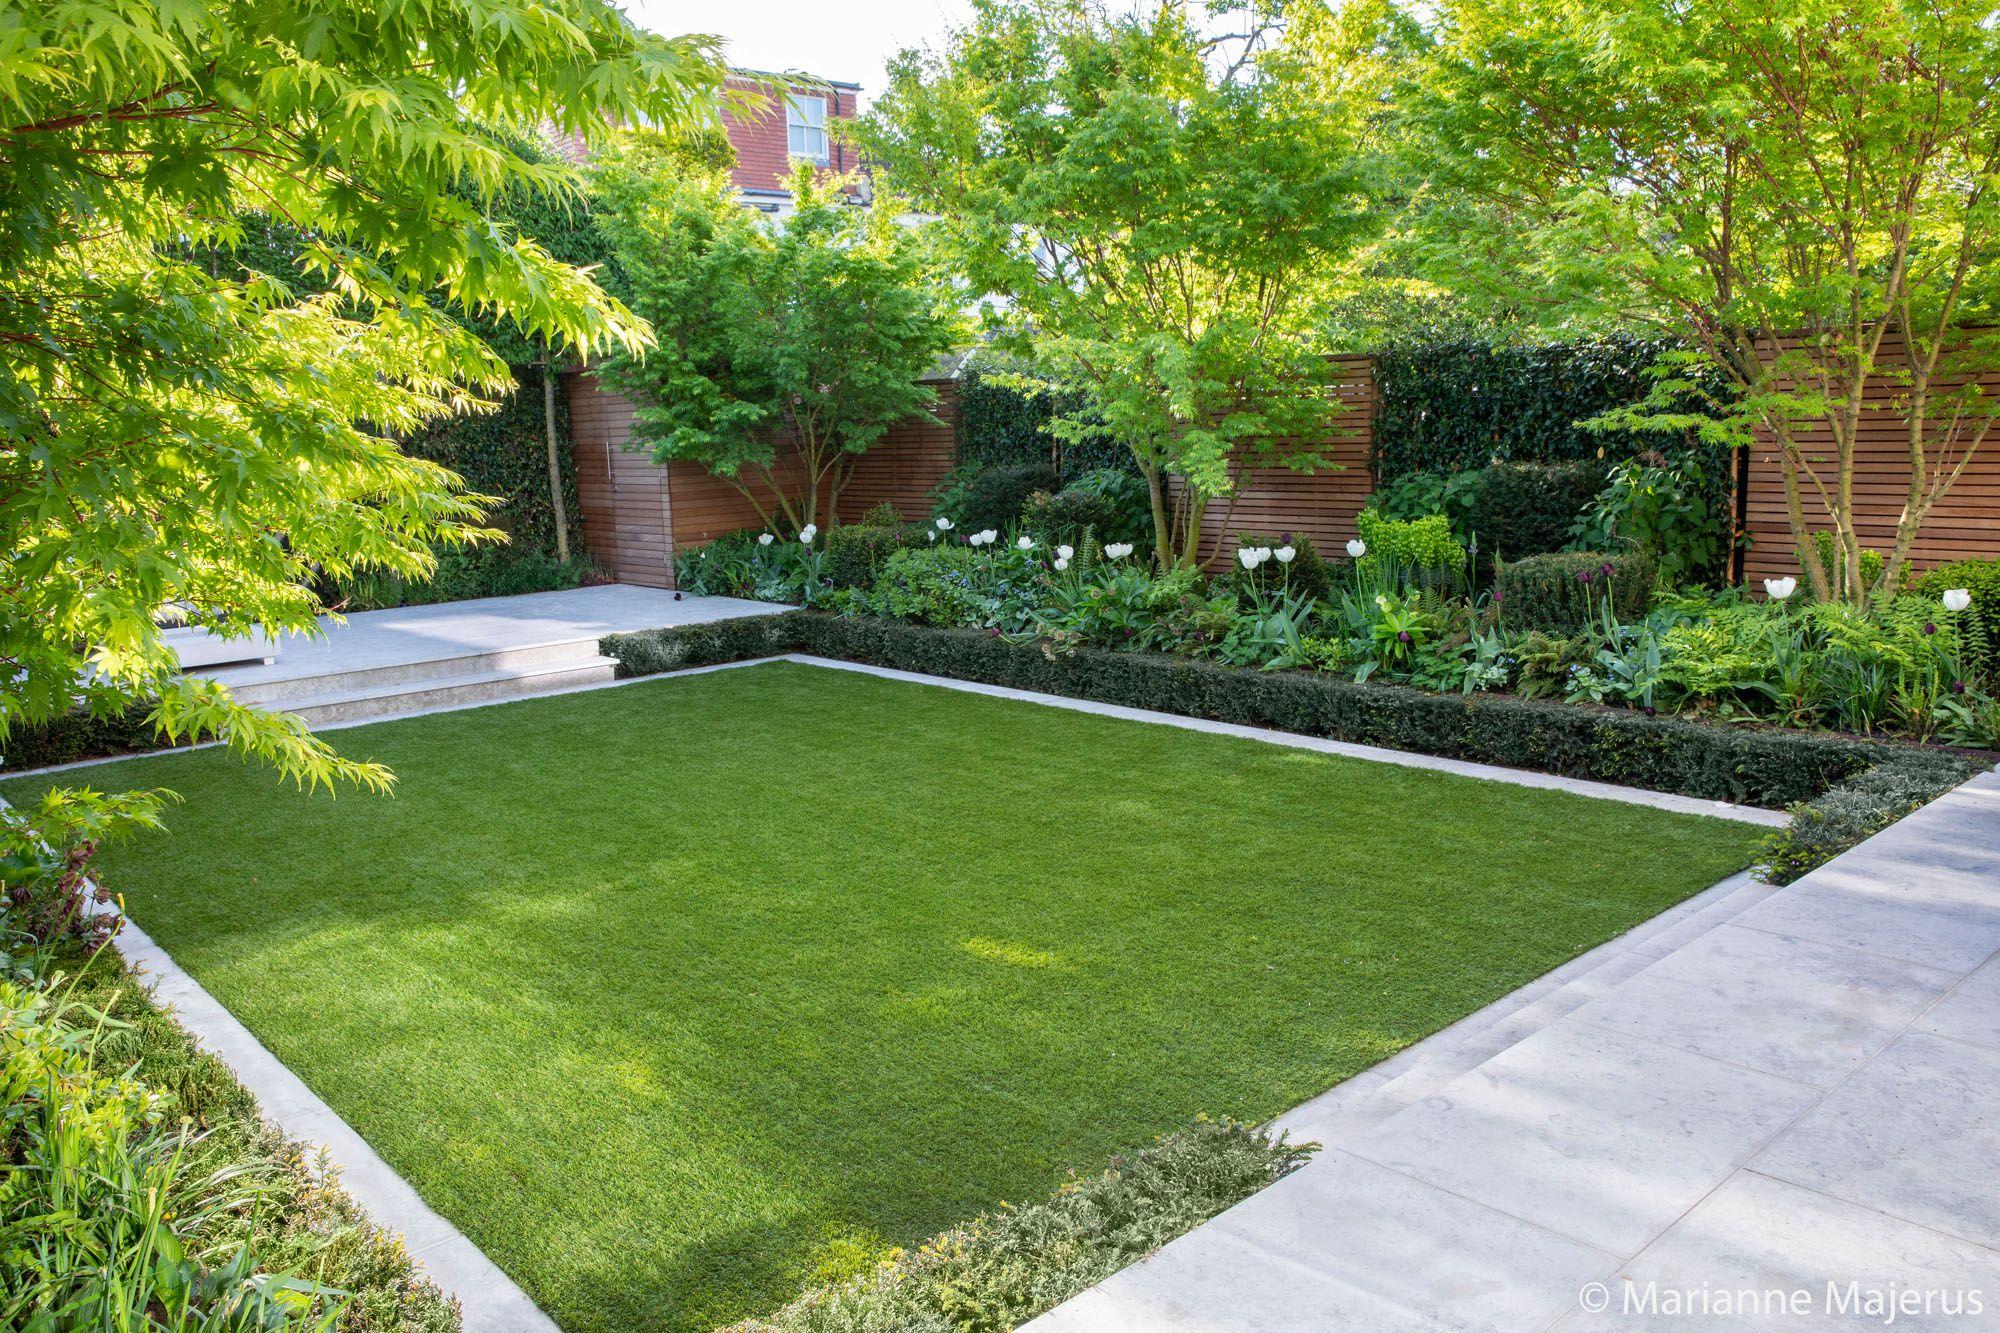 East Sheen Family Garden Garden Design Landscaping Project